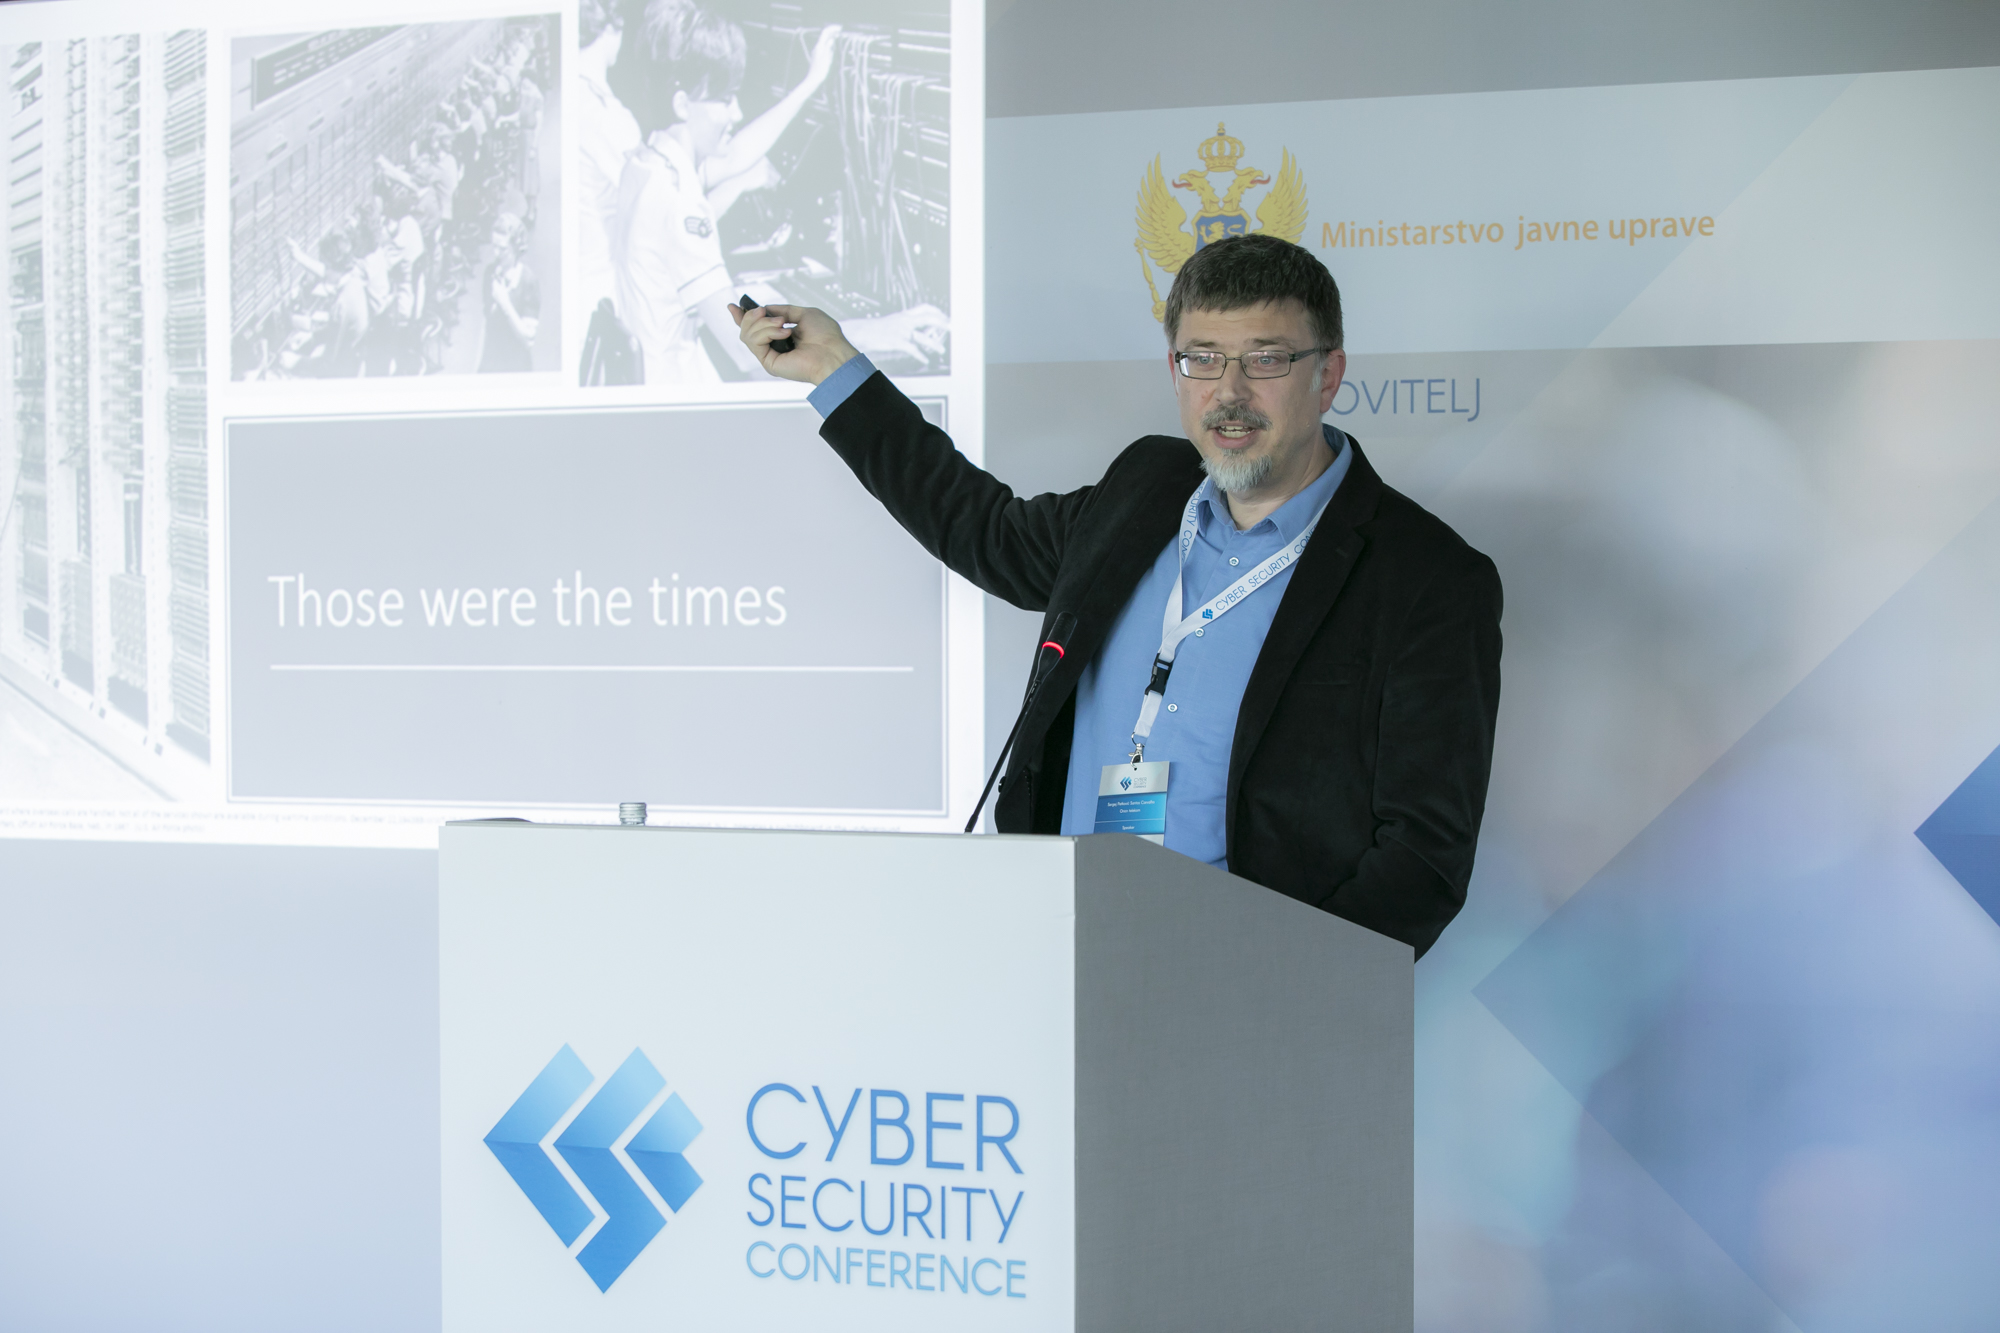 Nova Defense na Cyber Security konferenciji u Podgorici cover image